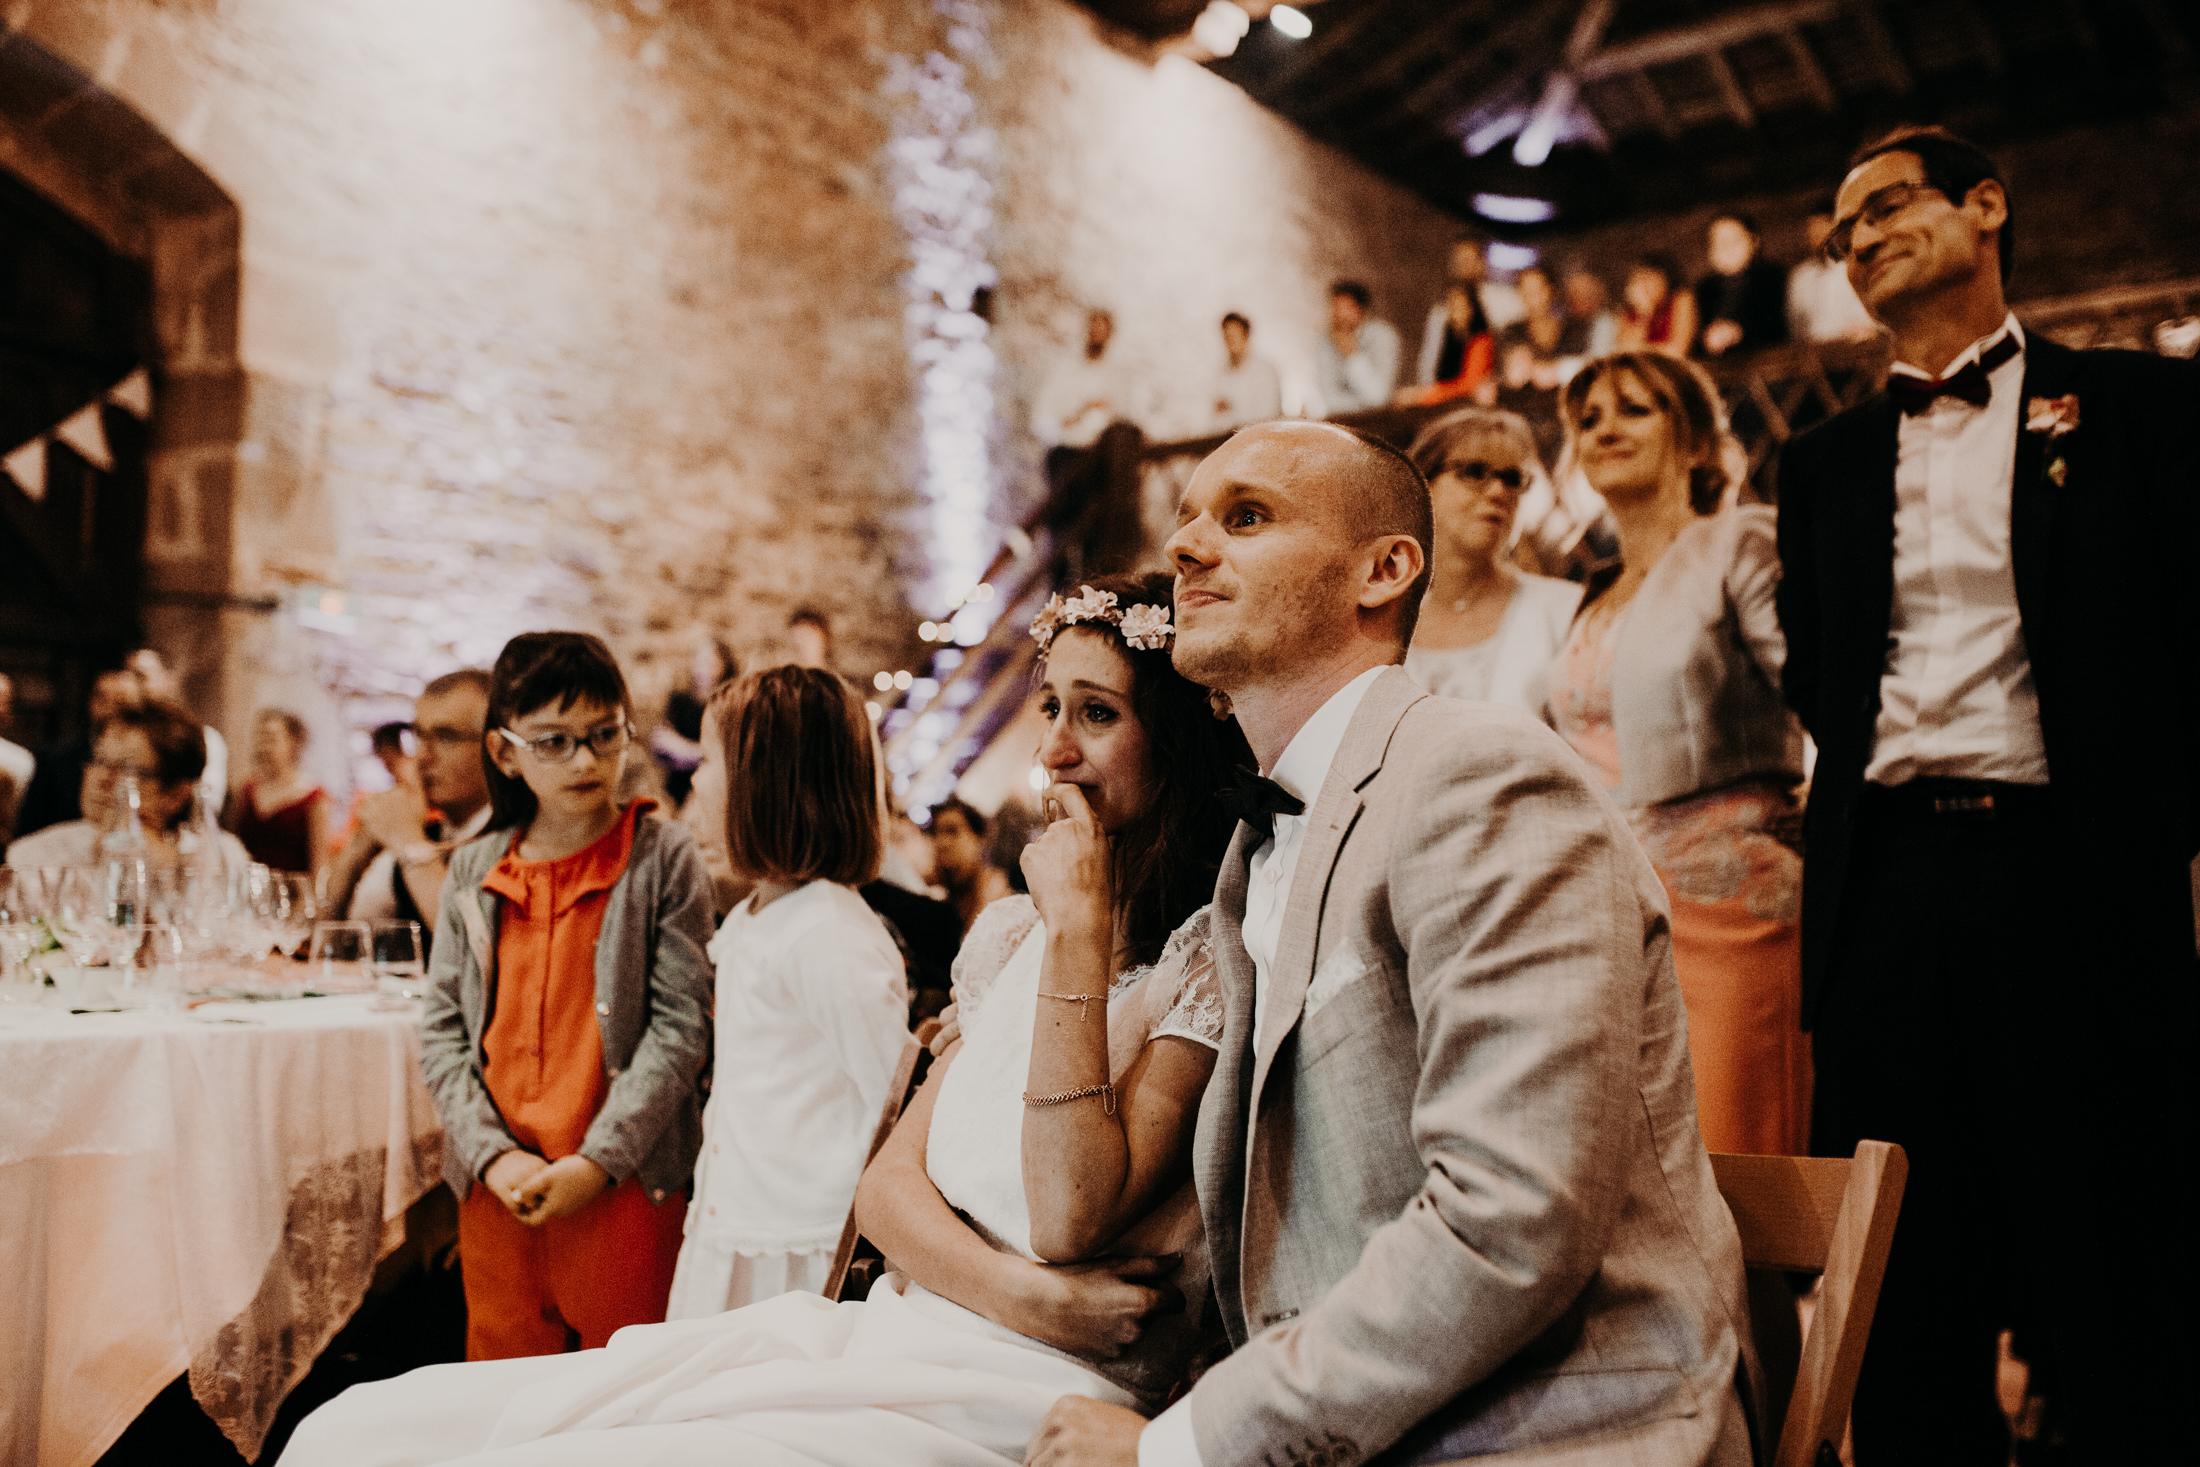 Mariage auvergne photographe wedding_-105.jpg